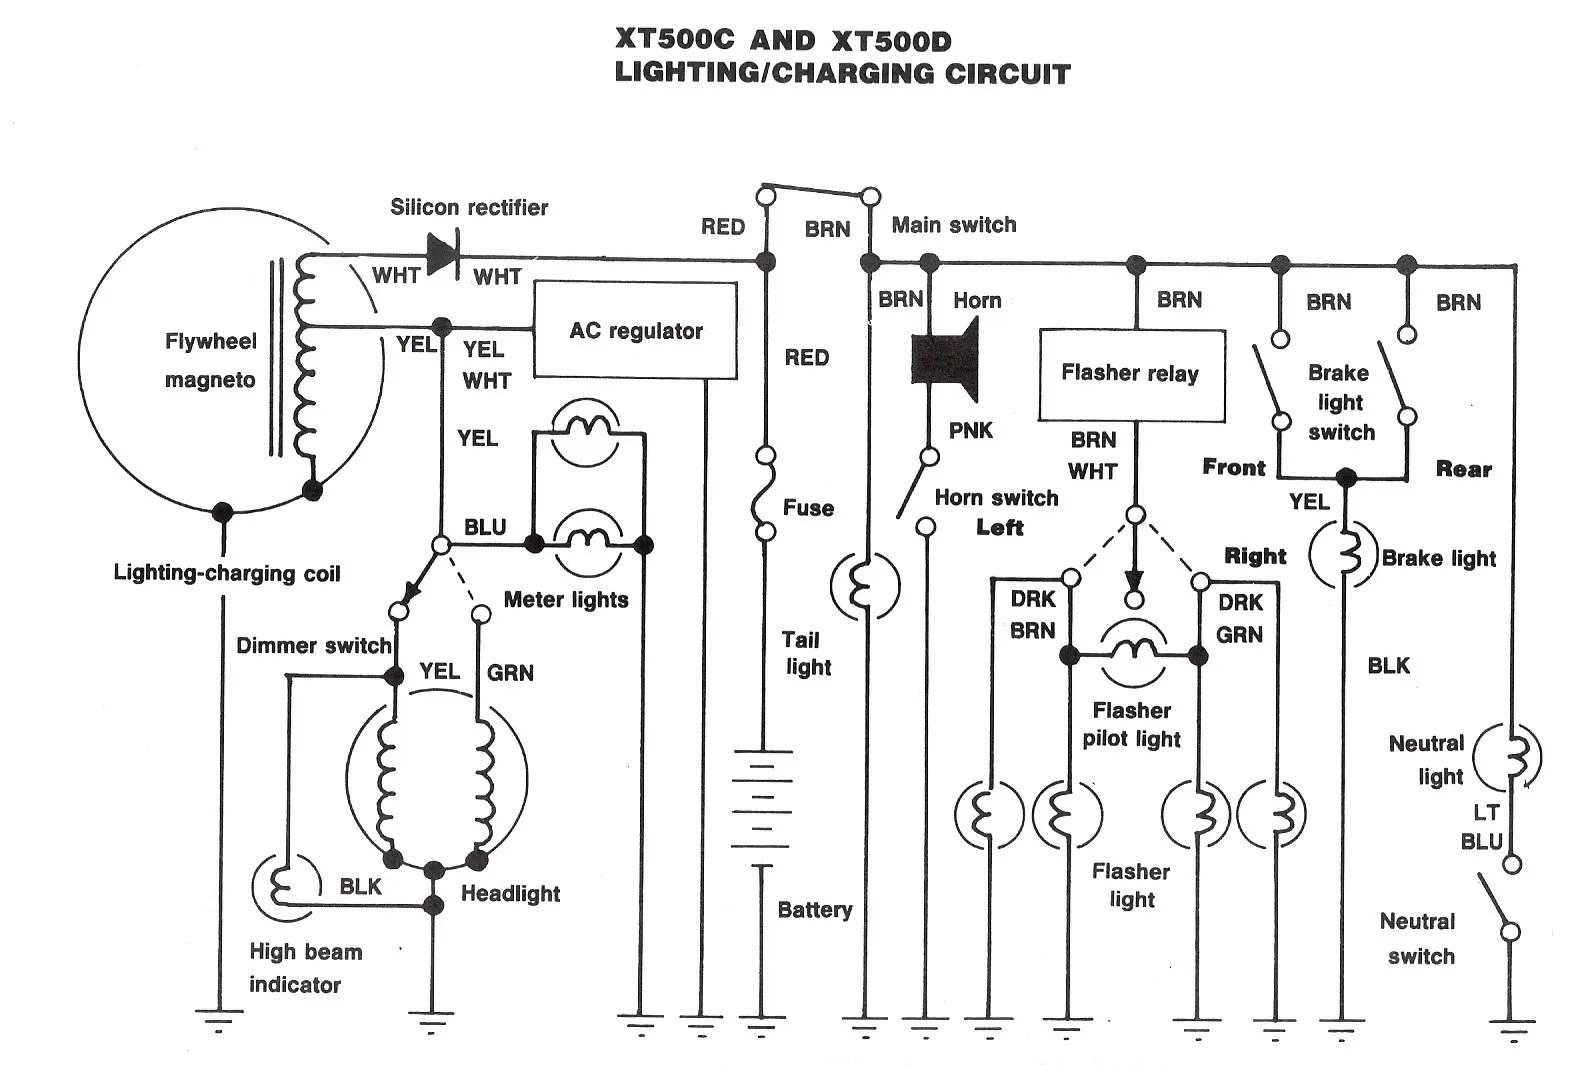 hight resolution of yamaha tt500 wiring diagram wiring diagramyamaha tt500 wiring diagram schematic diagramxt 500 wiring diagram 19 sg